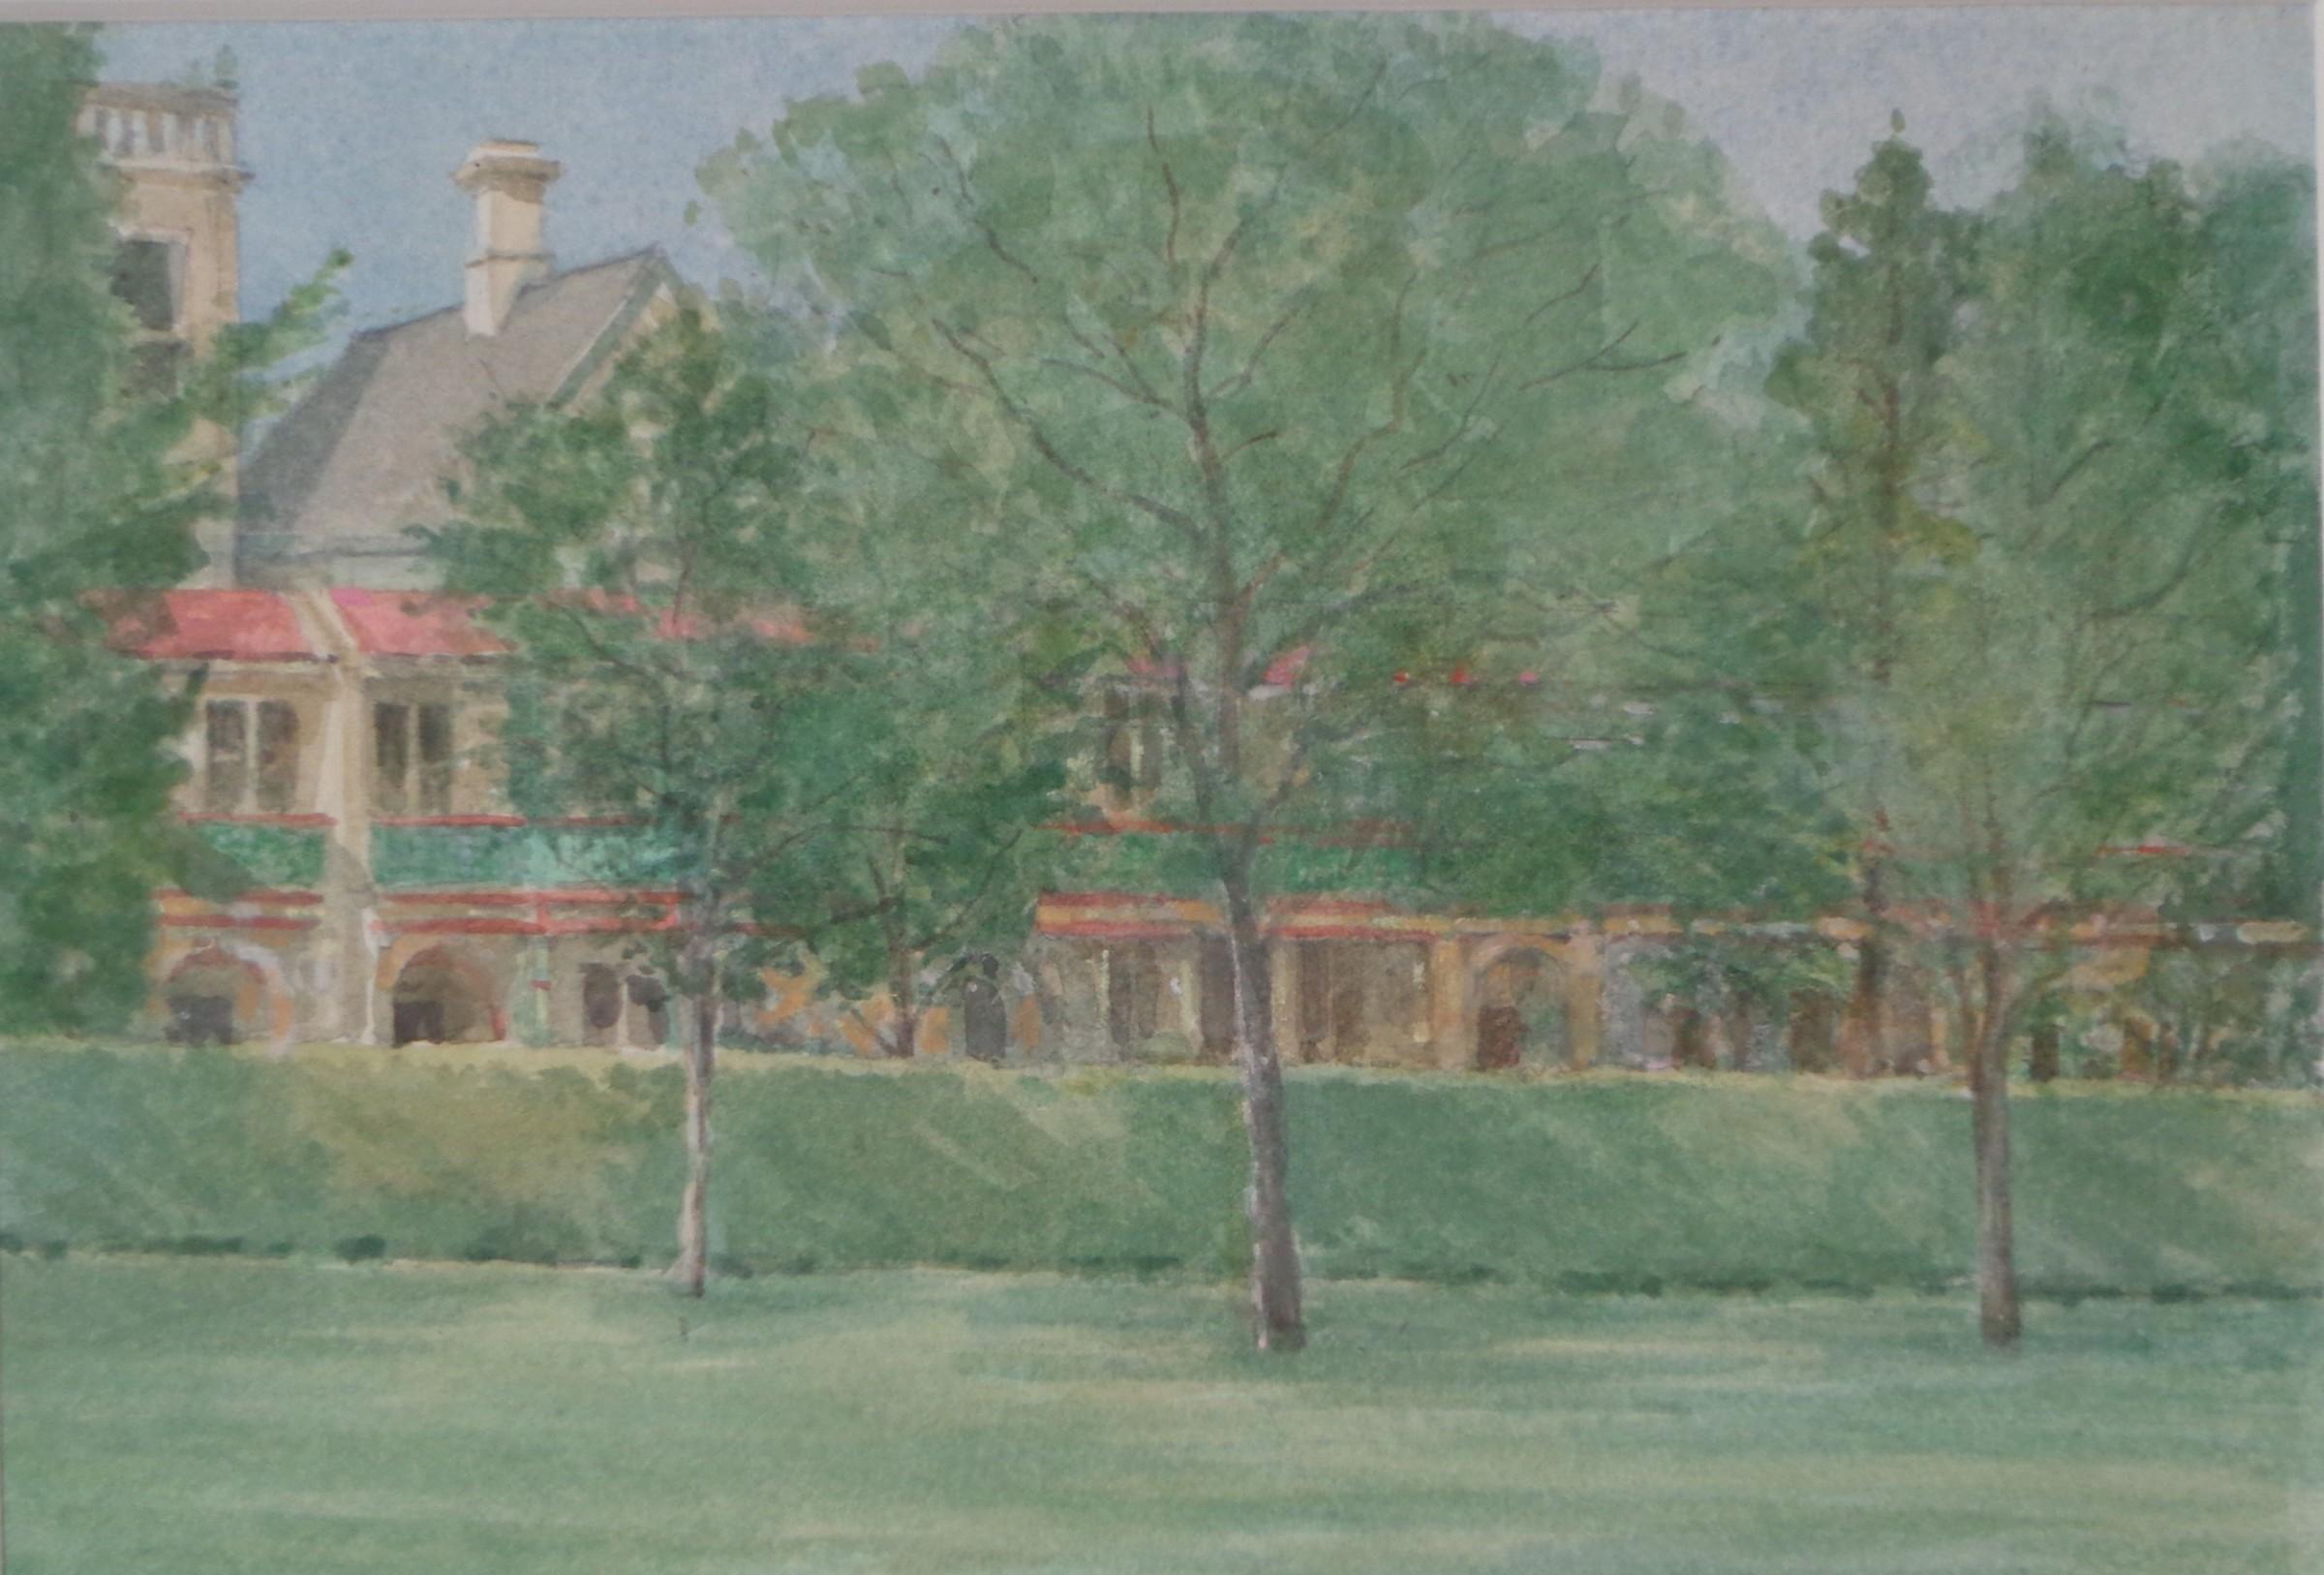 "<span class=""link fancybox-details-link""><a href=""/artists/90-david-payne/works/11329-david-payne-town-houses-bondi/"">View Detail Page</a></span><div class=""artist""><span class=""artist""><strong>David Payne</strong></span></div><div class=""title""><em>Town Houses Bondi</em></div><div class=""medium"">watercolour</div><div class=""dimensions"">35x42cm</div><div class=""price"">£395.00</div>"